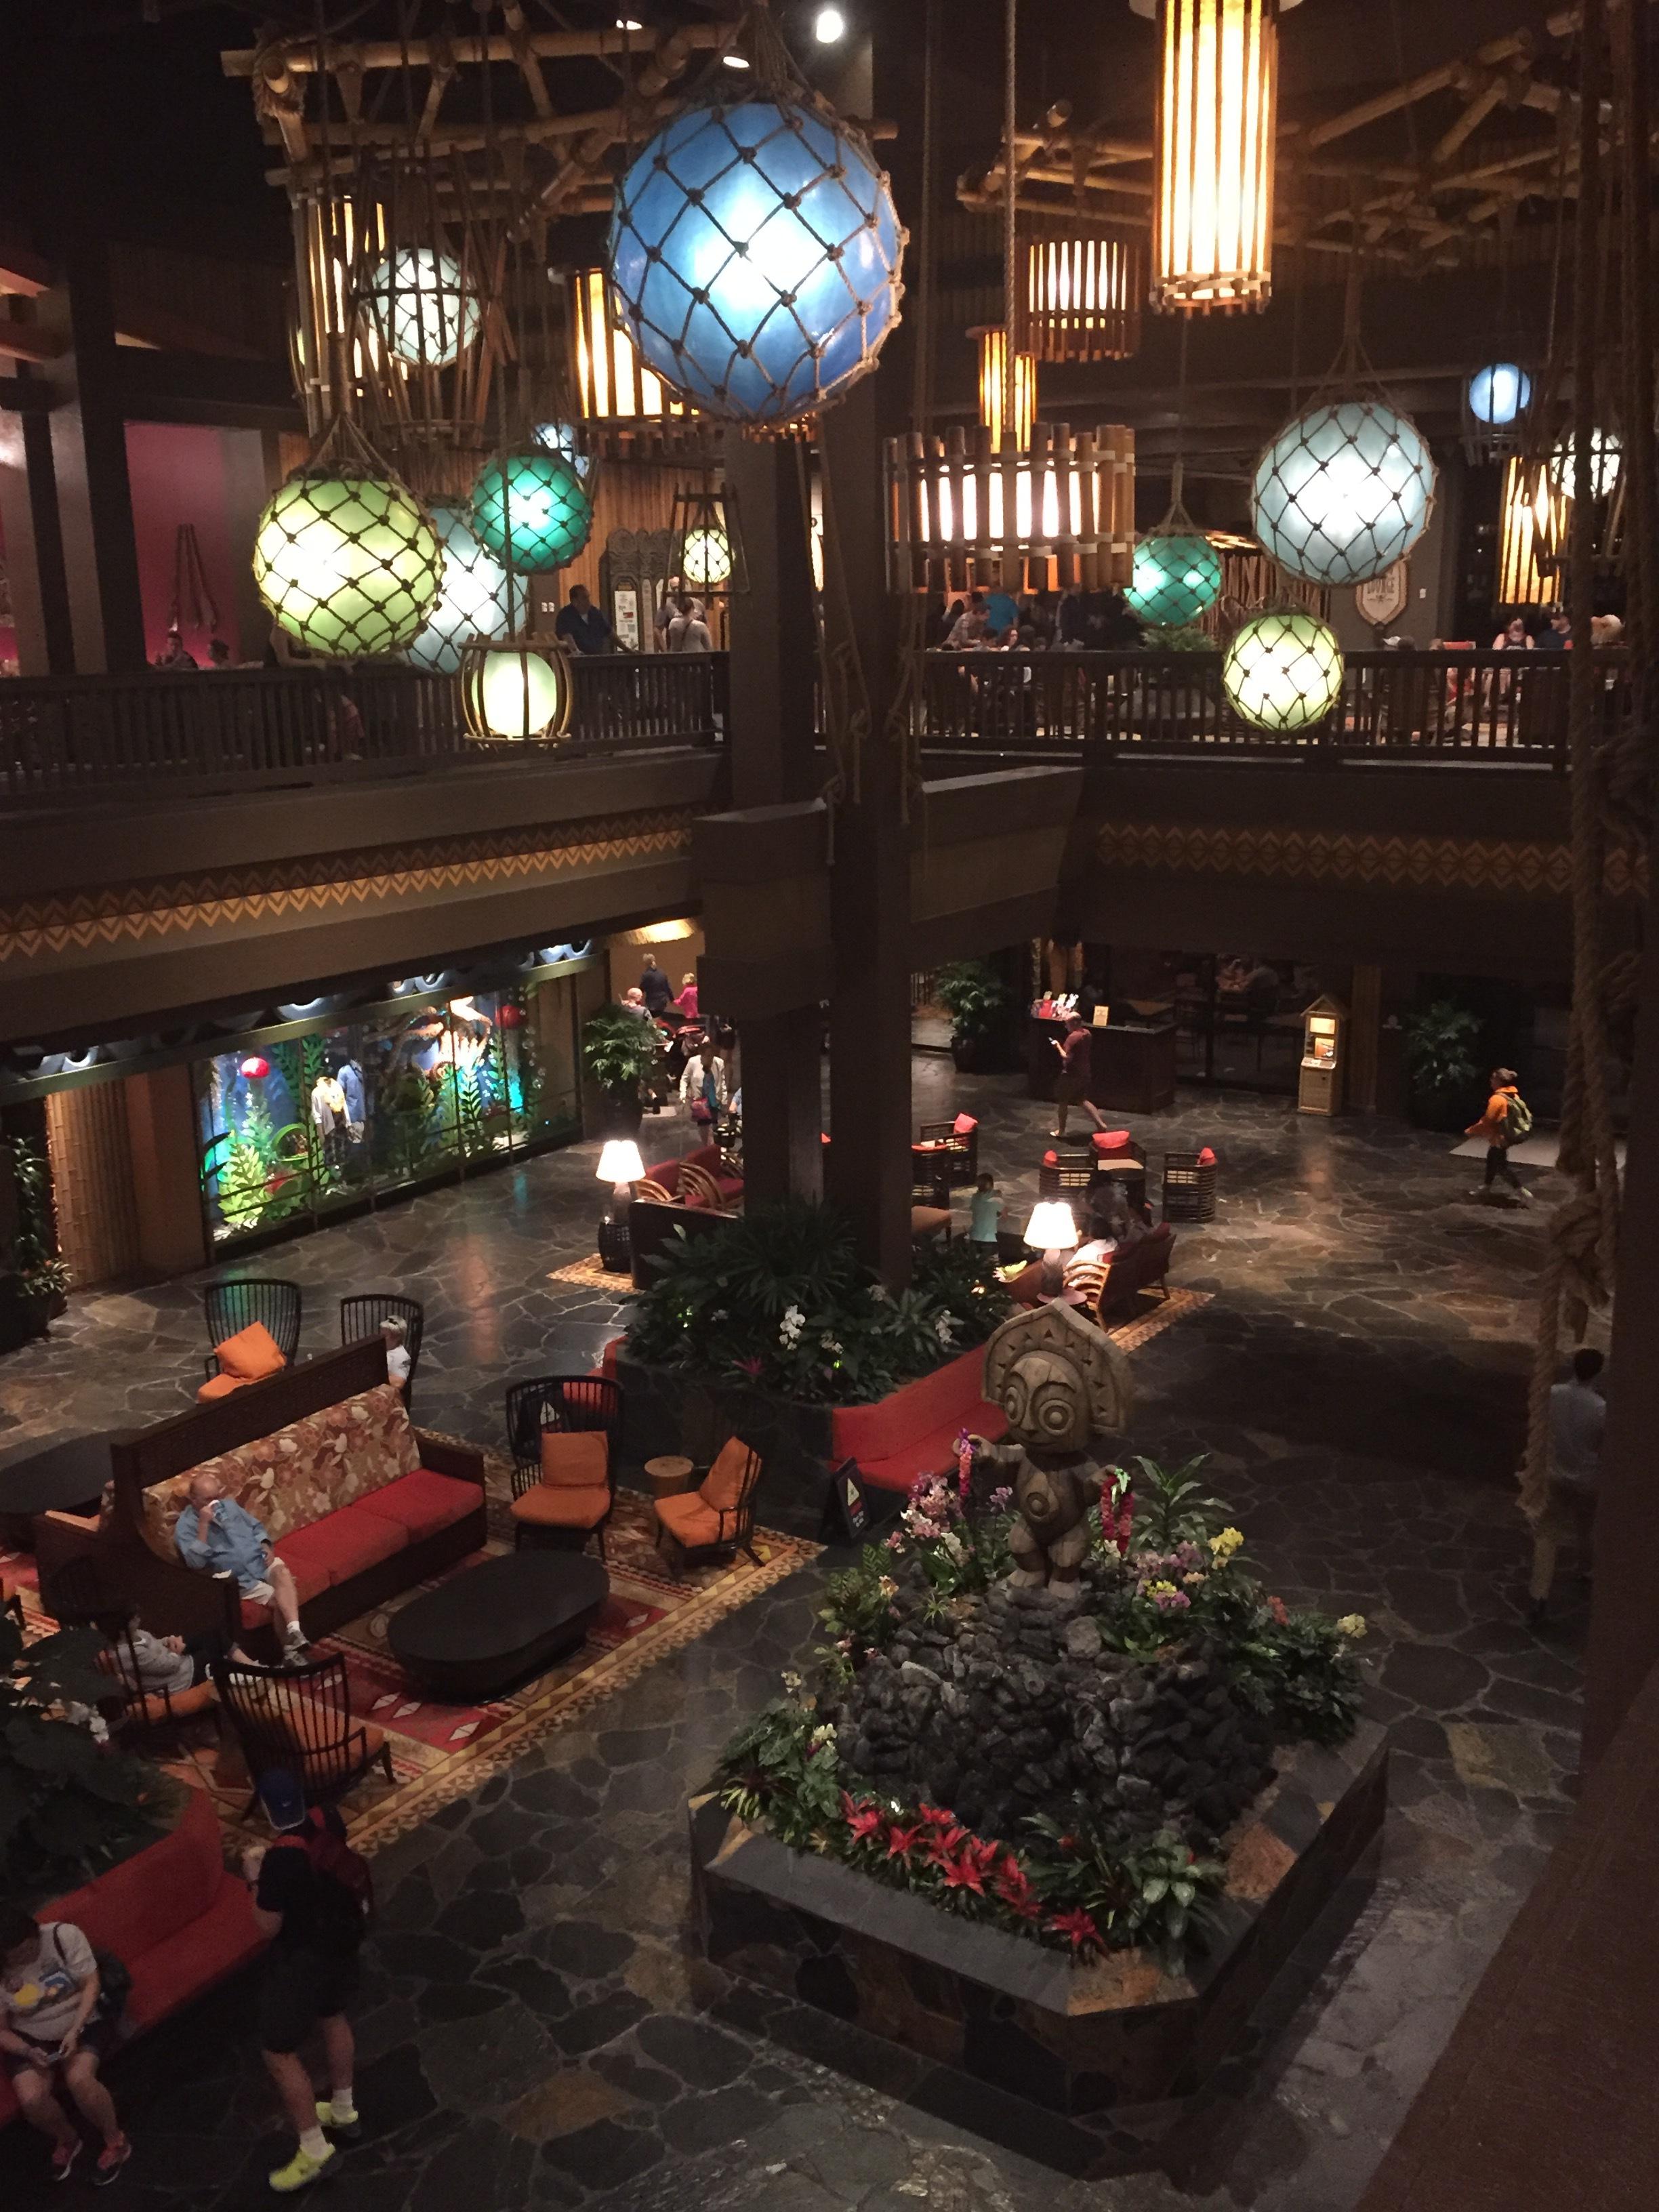 The Polynesian lobby